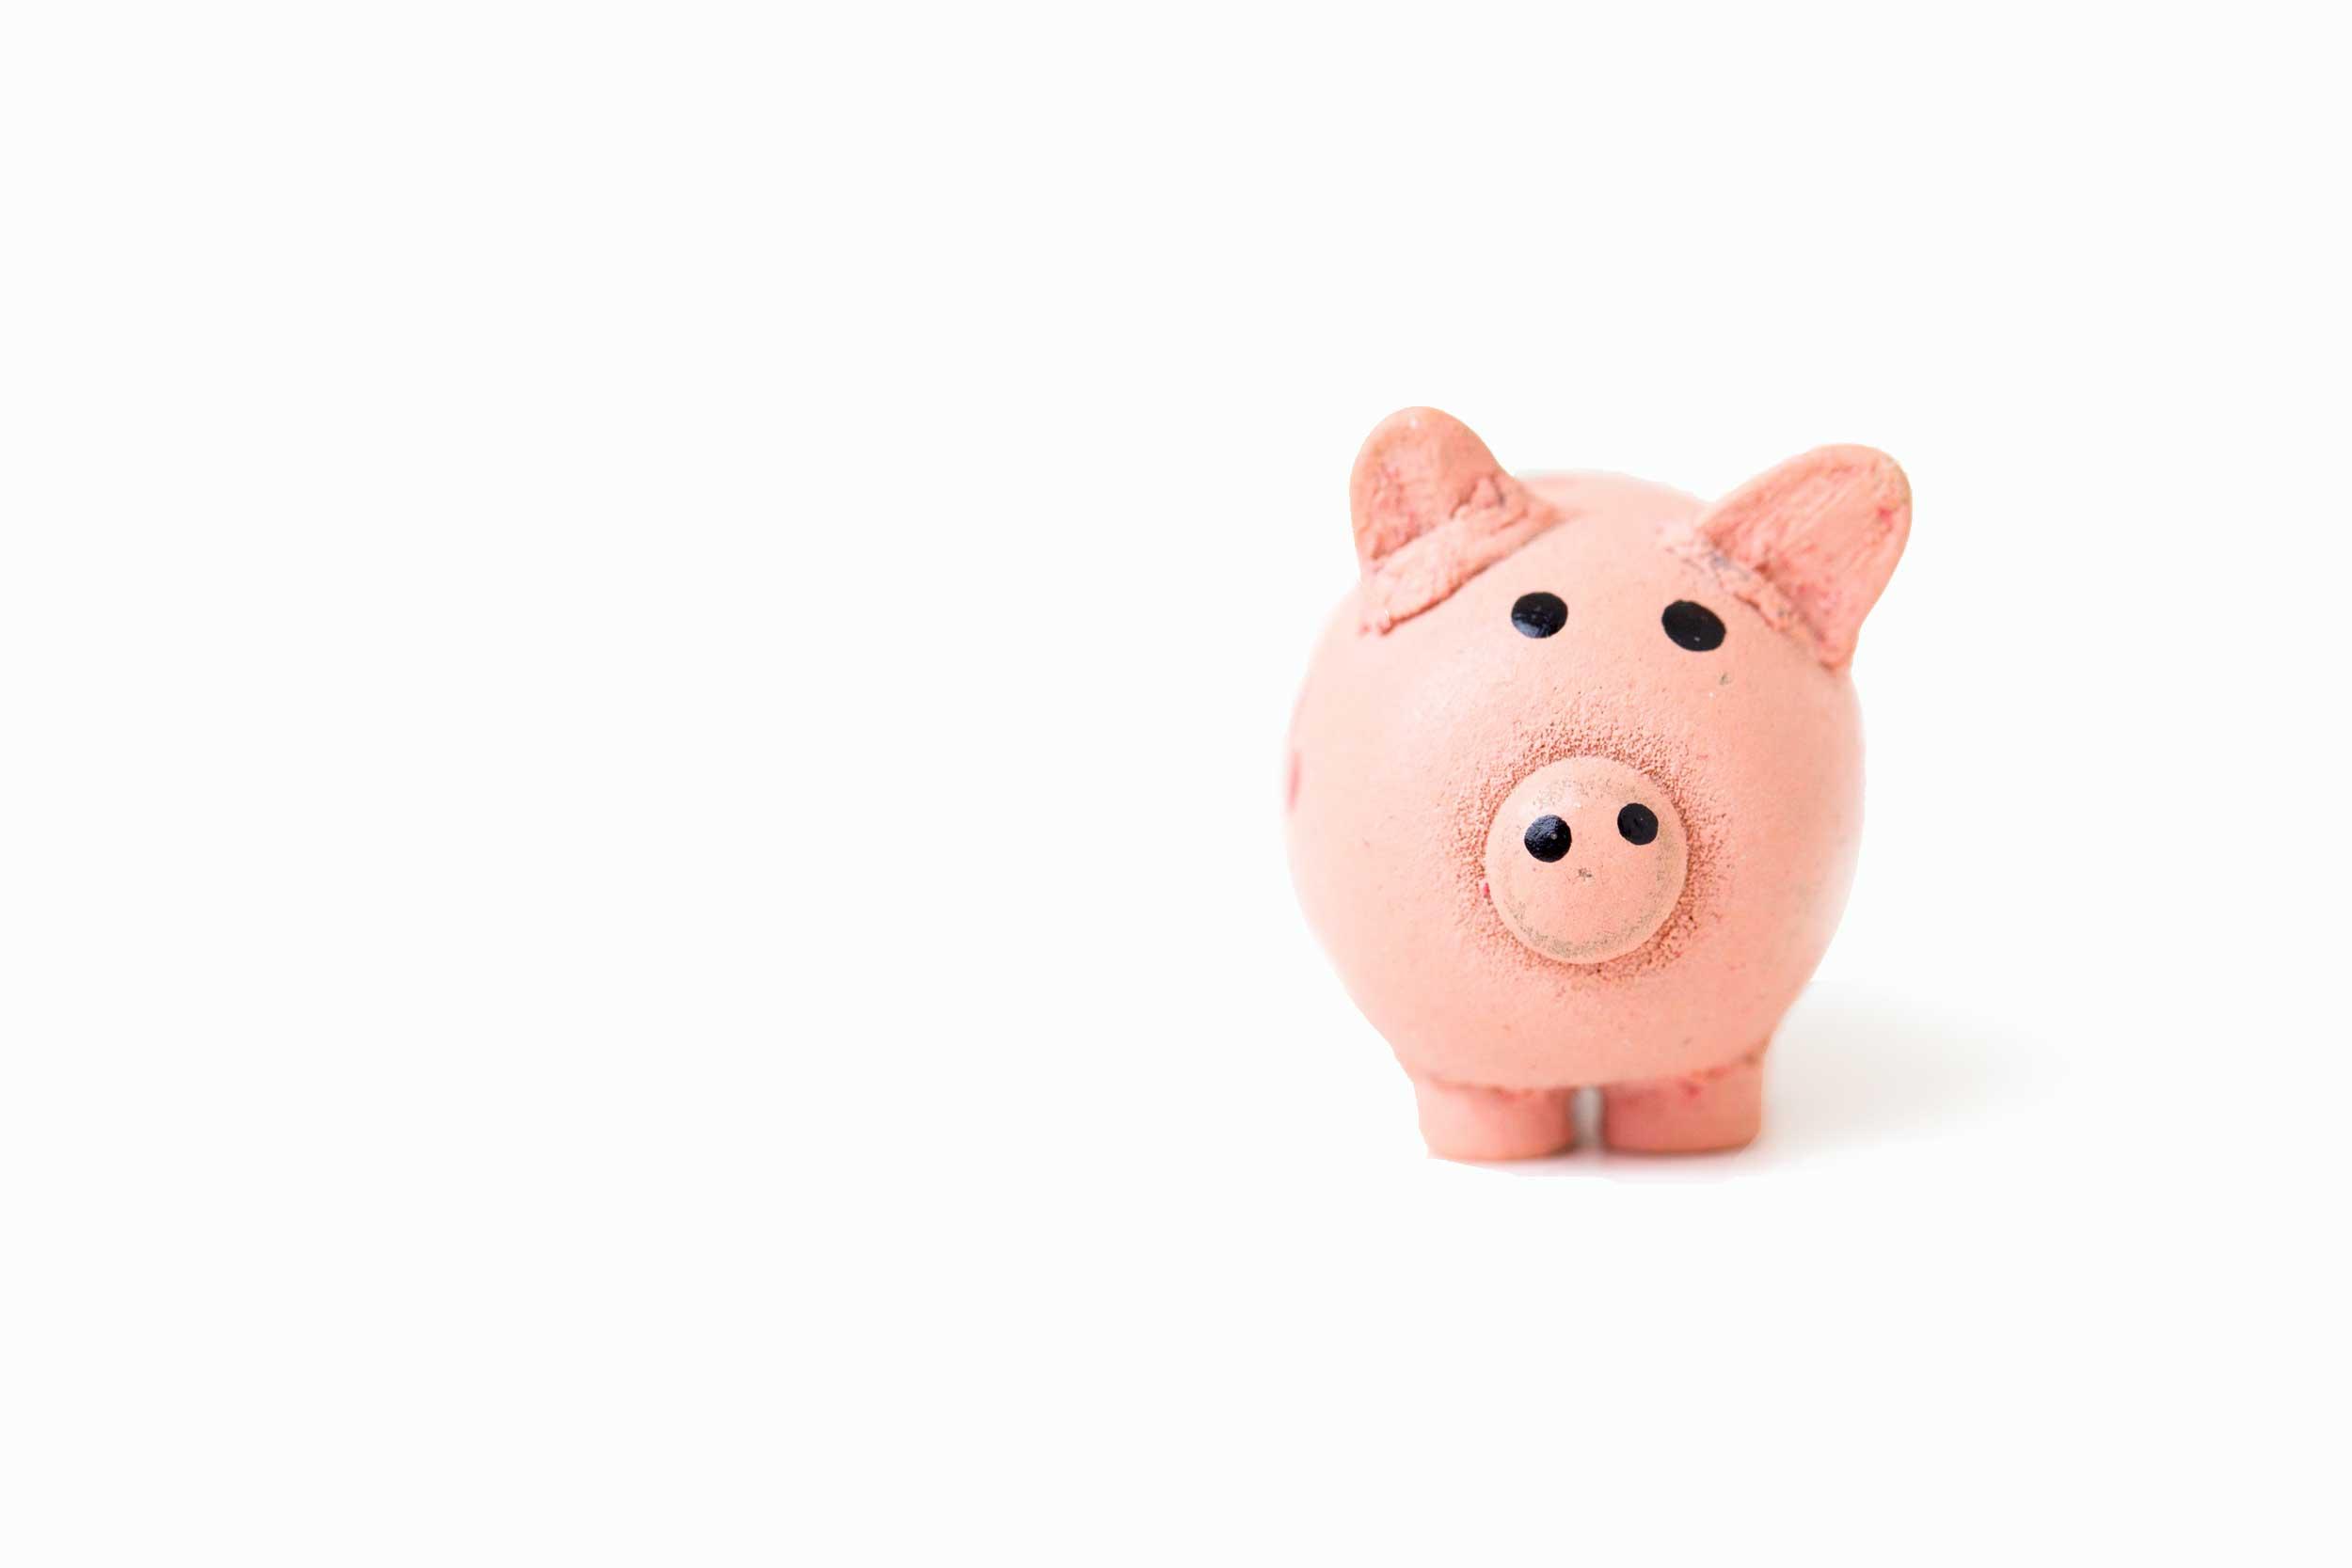 Clay piggy bank